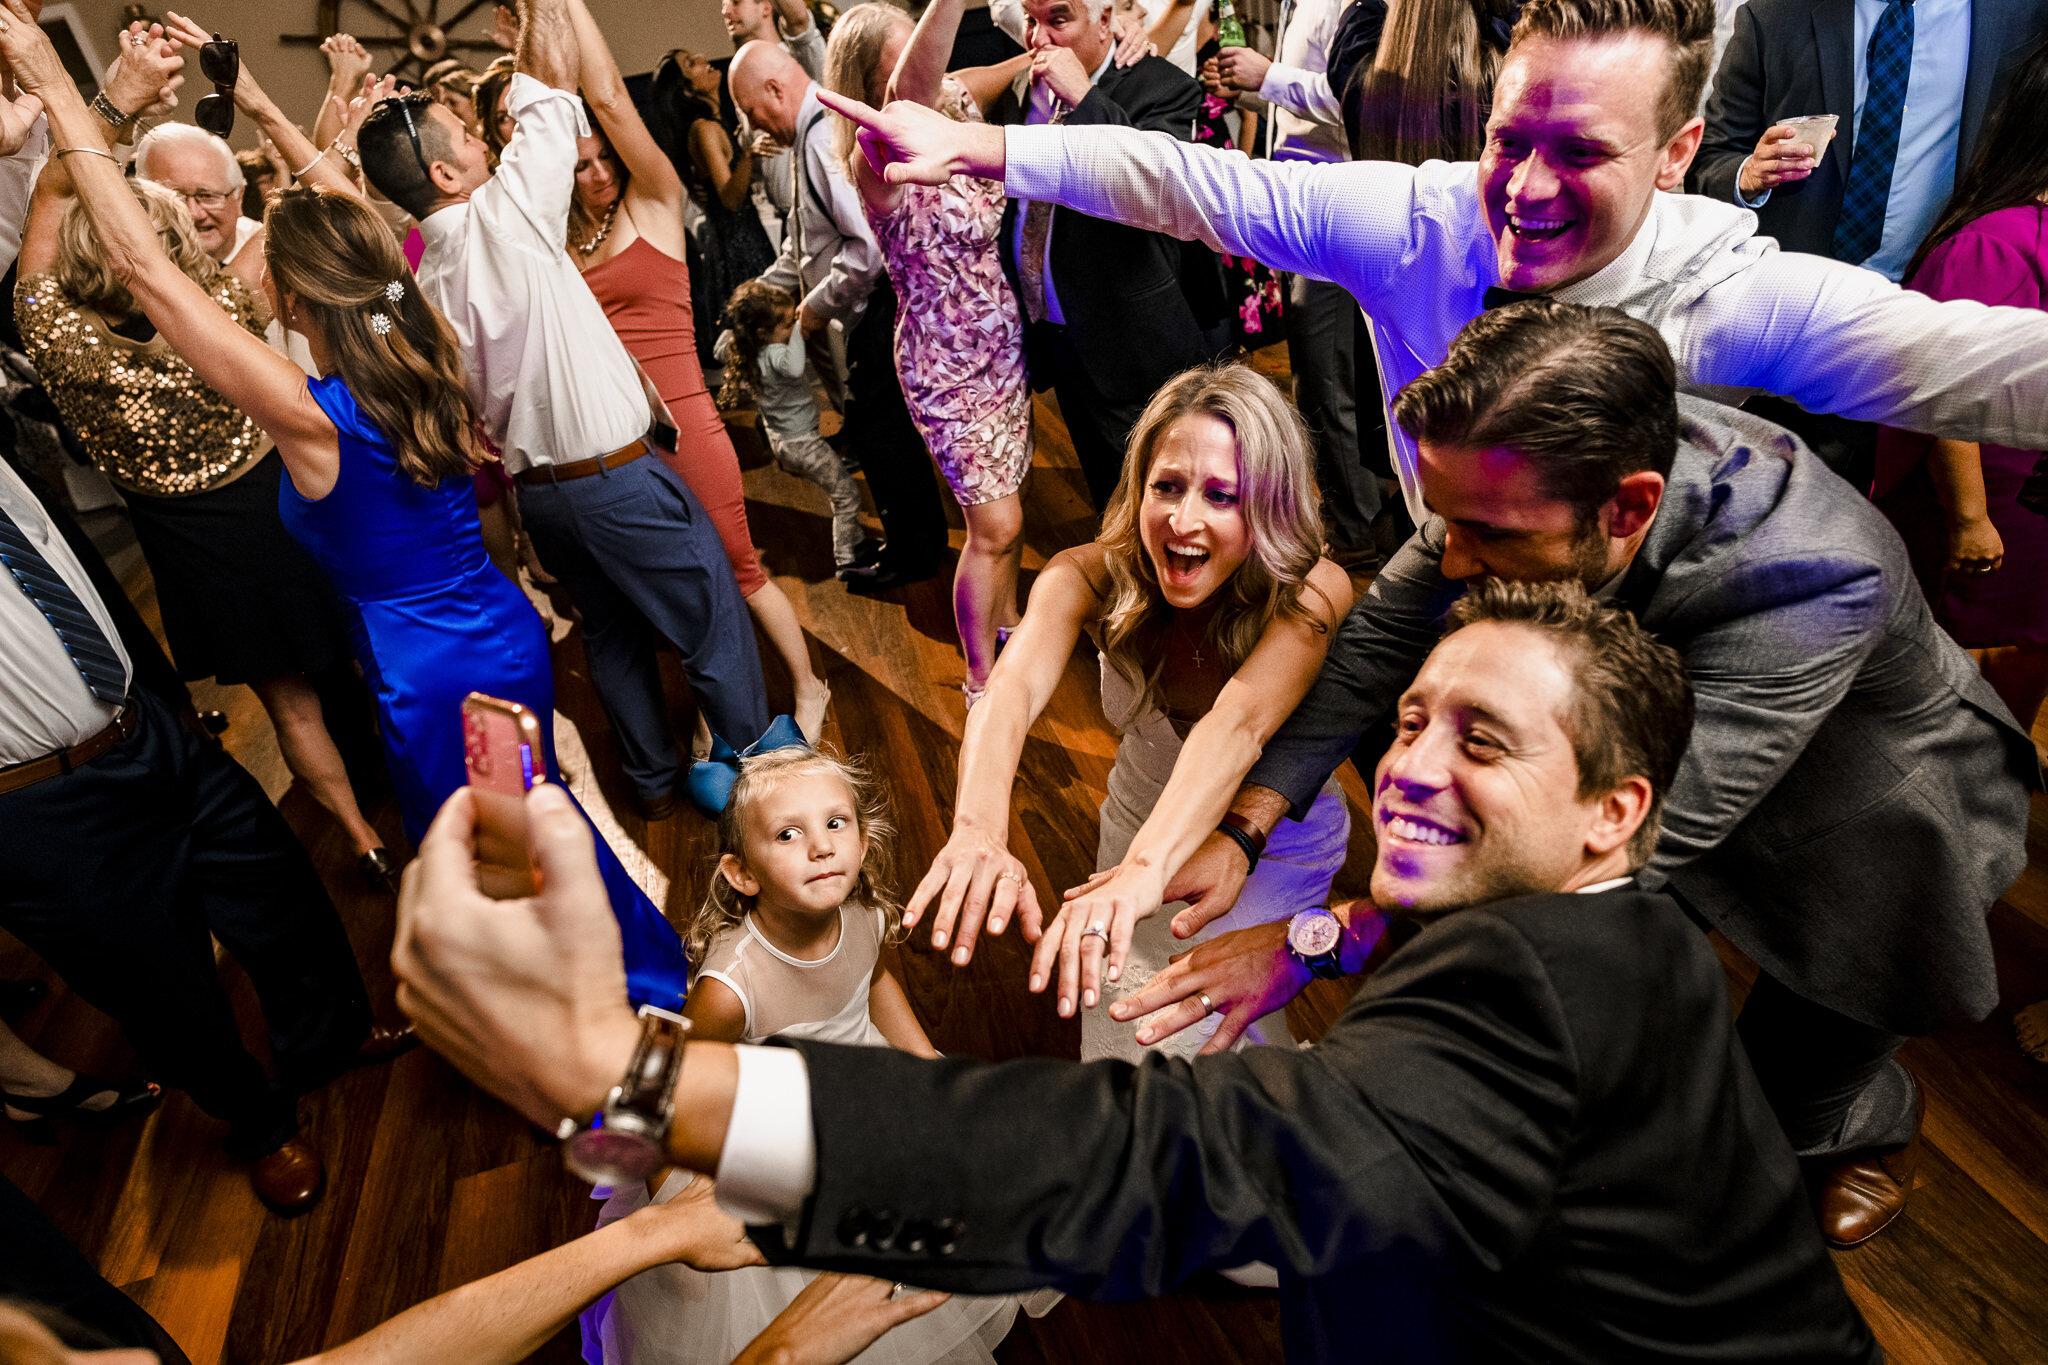 Snell-Ocean-City-Yacht-Club-New-Jersey-Wedding-Photographer-39.JPG